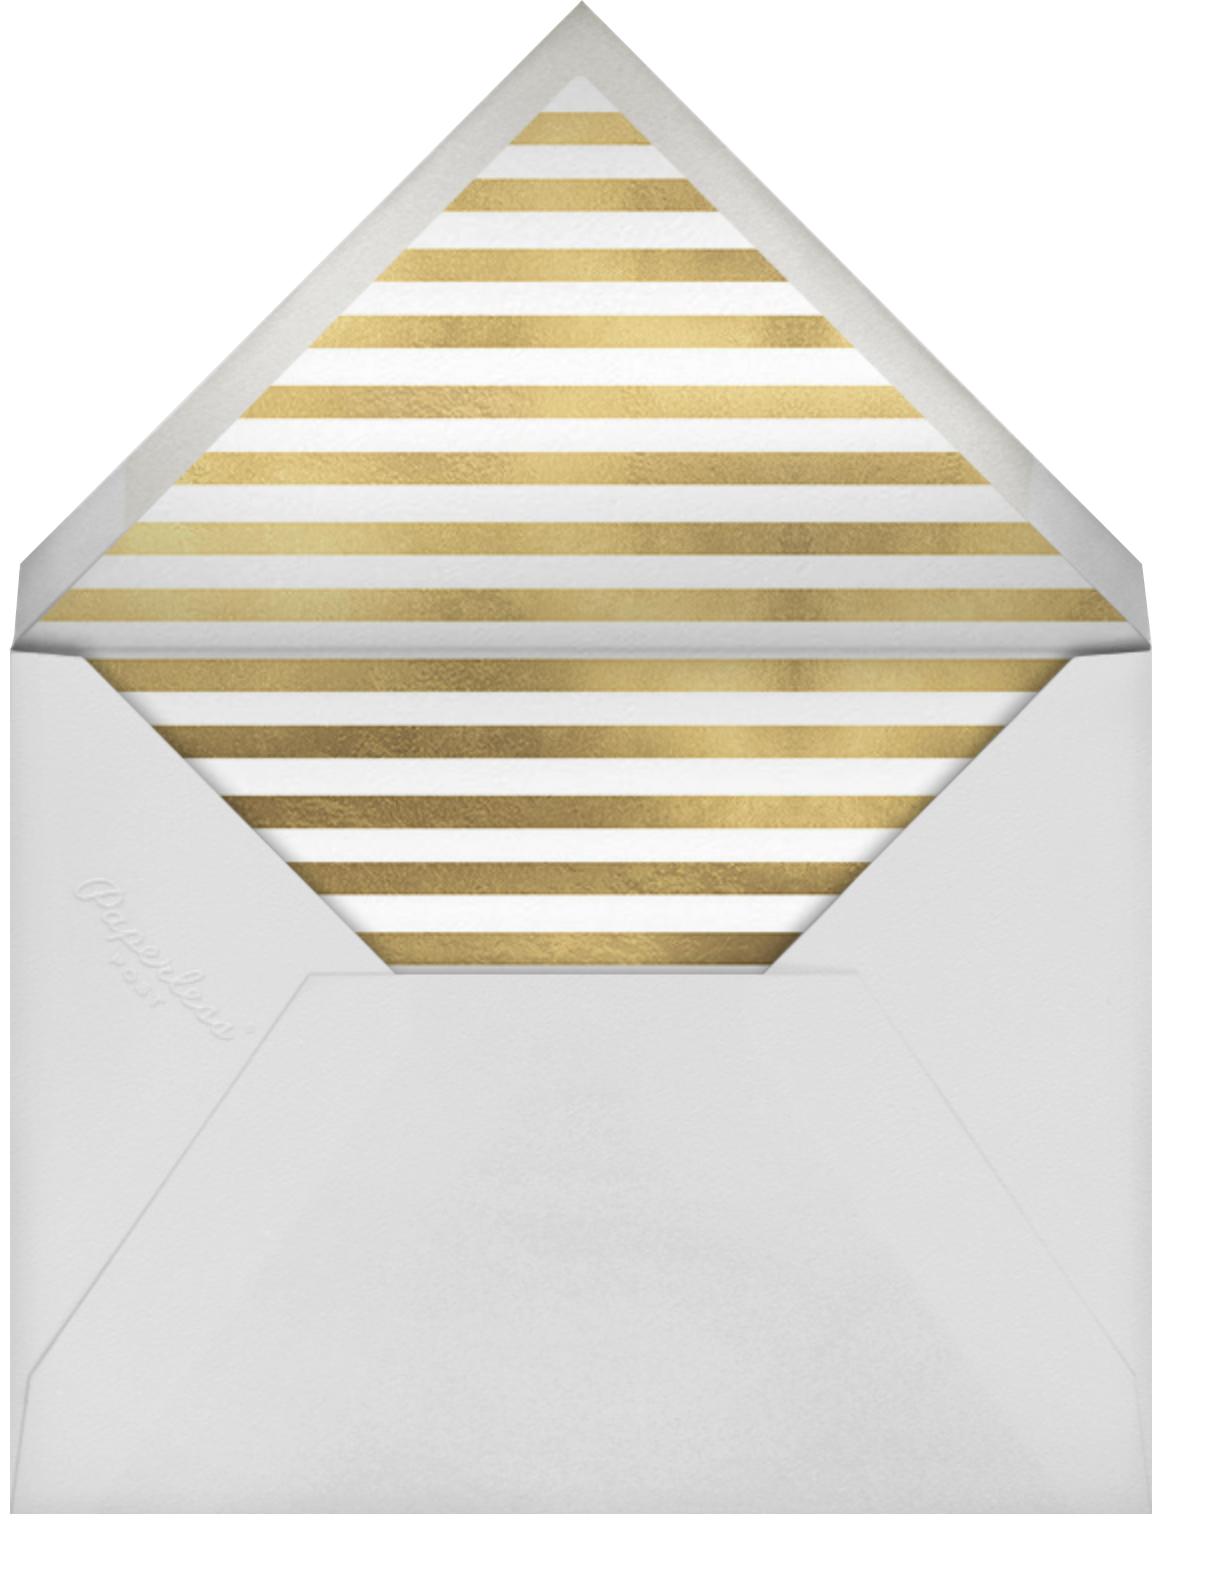 Fortune - kate spade new york - Birthday - envelope back